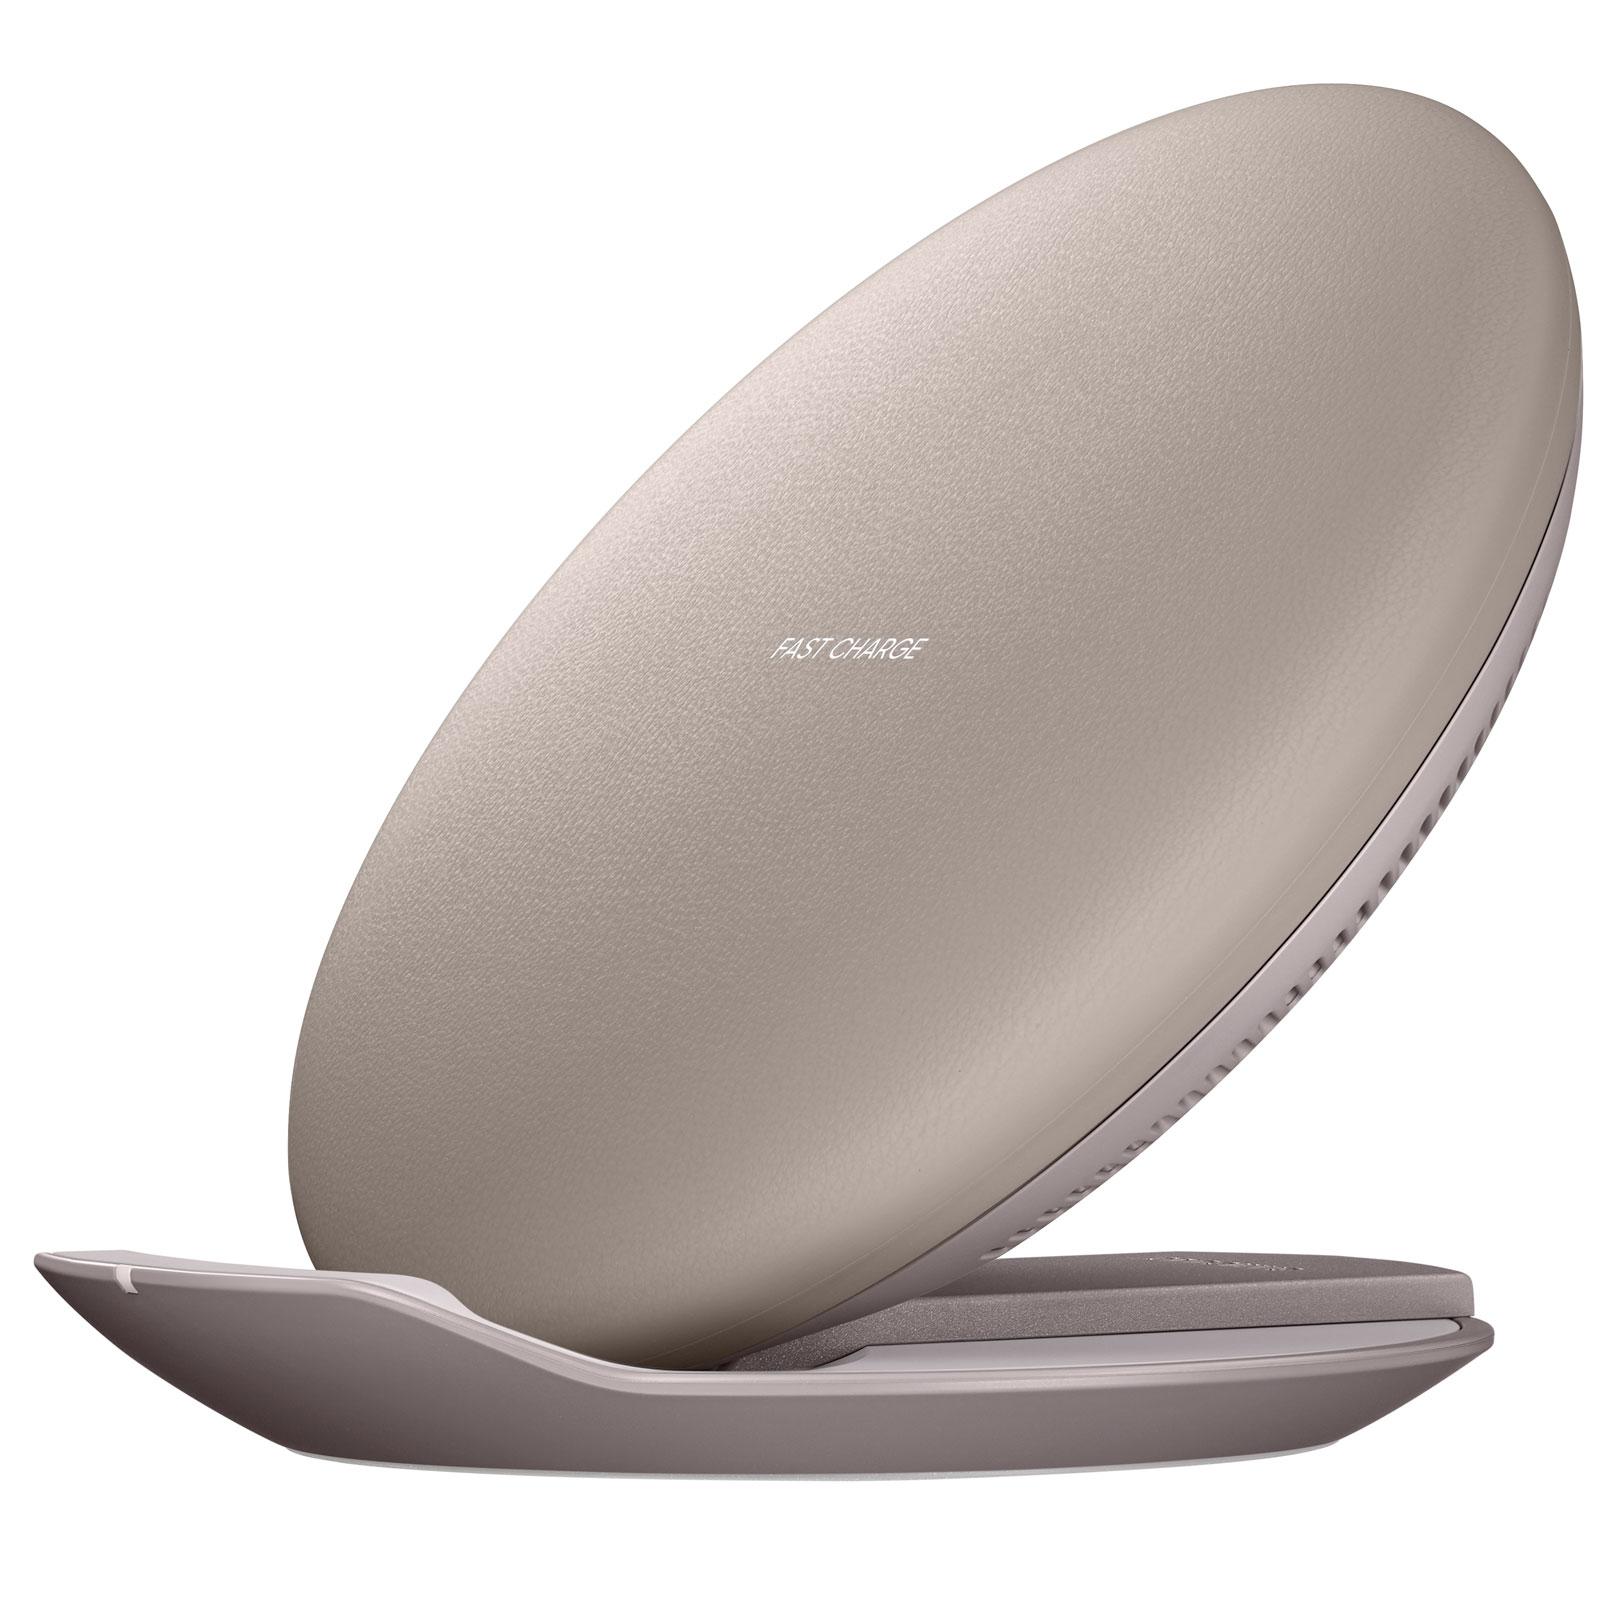 samsung pad induction 2 positions marron chargeur t l phone samsung sur ldlc. Black Bedroom Furniture Sets. Home Design Ideas